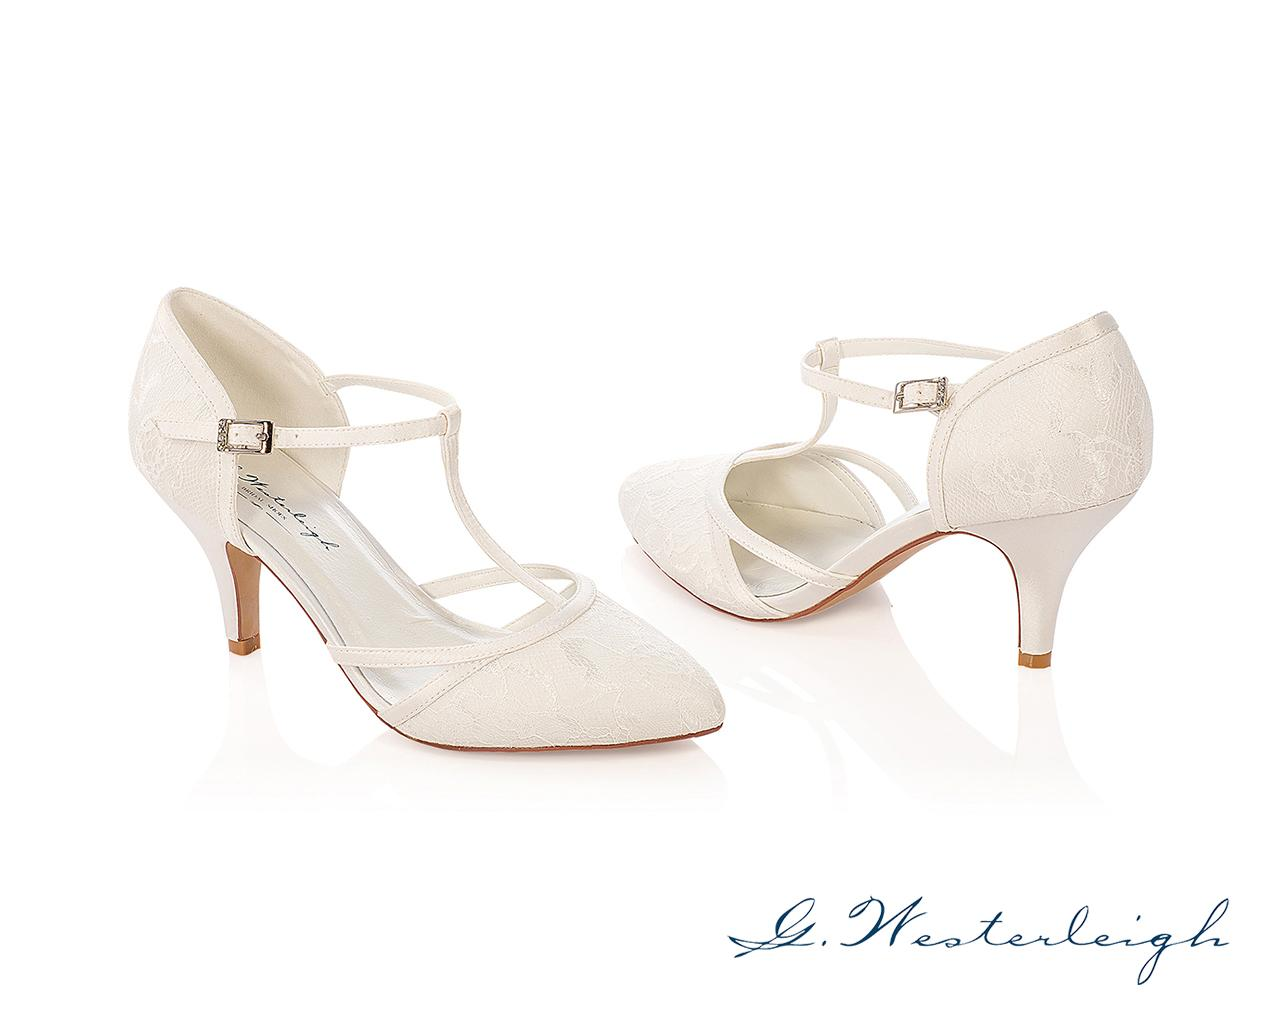 Svadobné topánky Jasmine - Obrázok č. 1